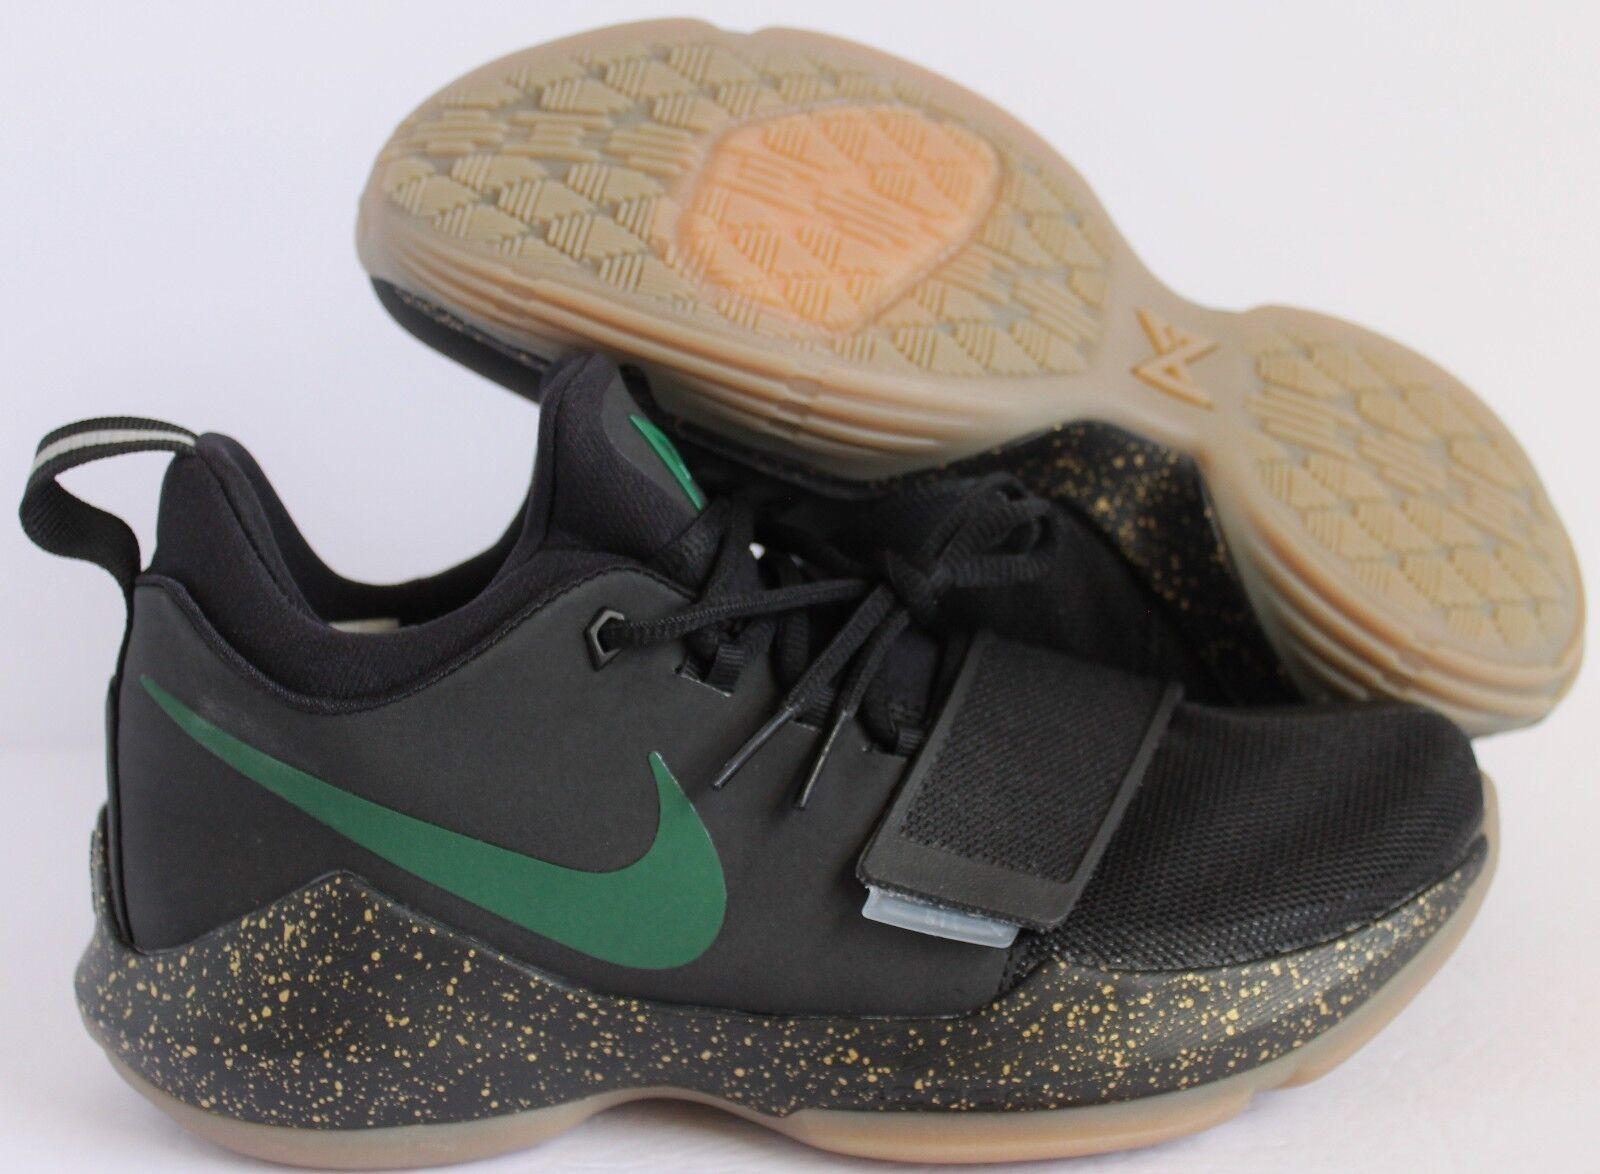 Nike PG 1 Paul George [AQ2790-992] ID noir-vert-Gold-Gum SZ 7.5 [AQ2790-992] George 8eaa1b